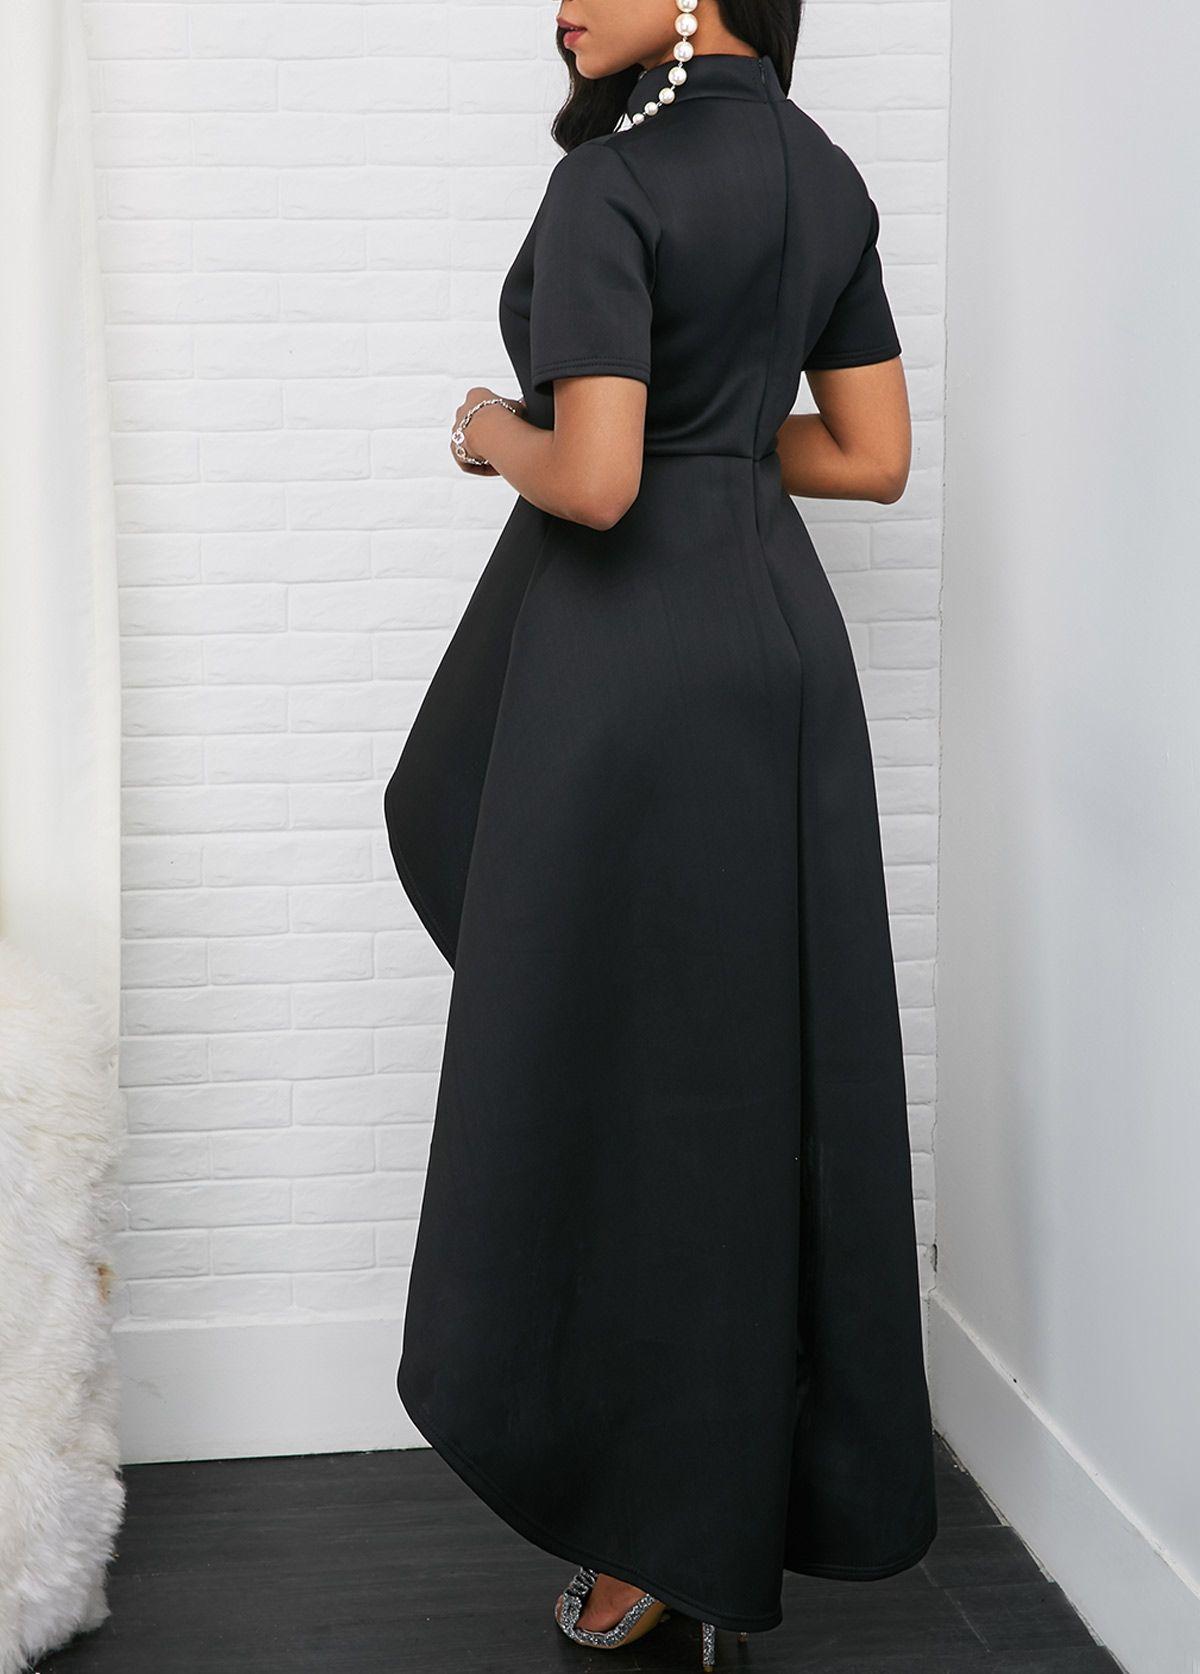 Mock Neck Short Sleeve Black High Low Dress Rotita Com Usd 37 57 Black High Low Dress Dresses High Low Dress [ 1674 x 1200 Pixel ]